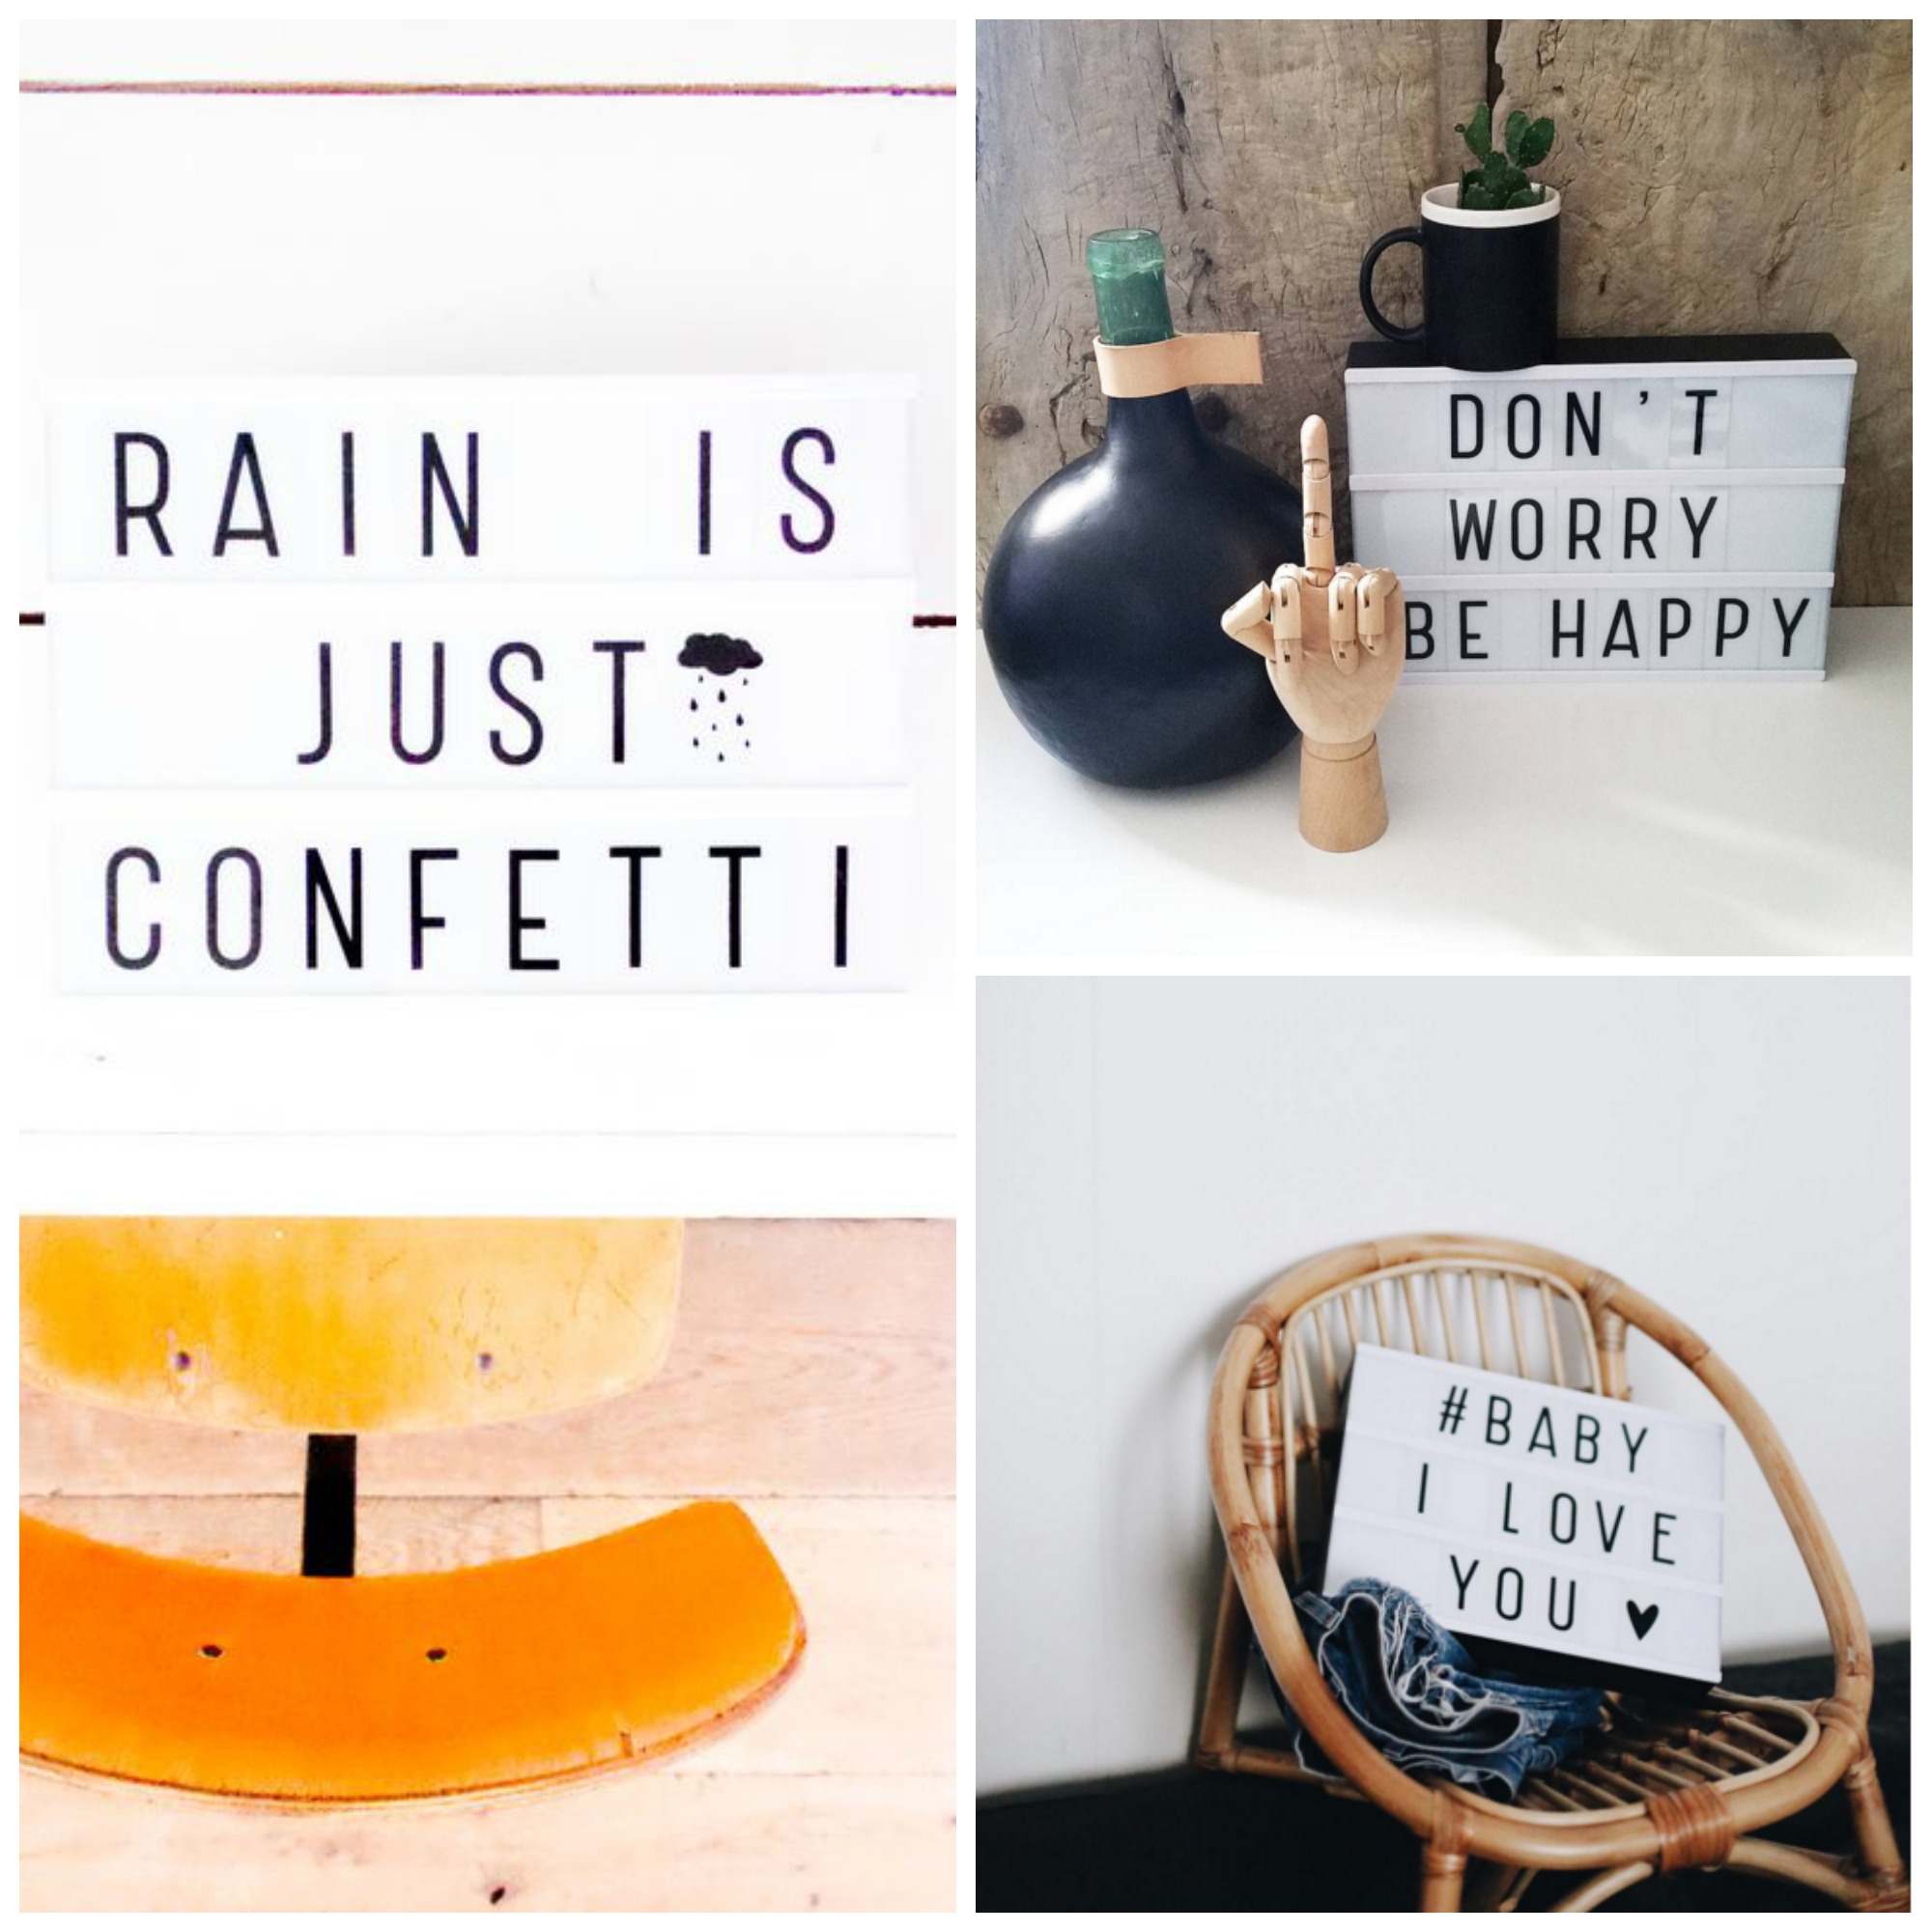 Lightbox via Instagram Collage